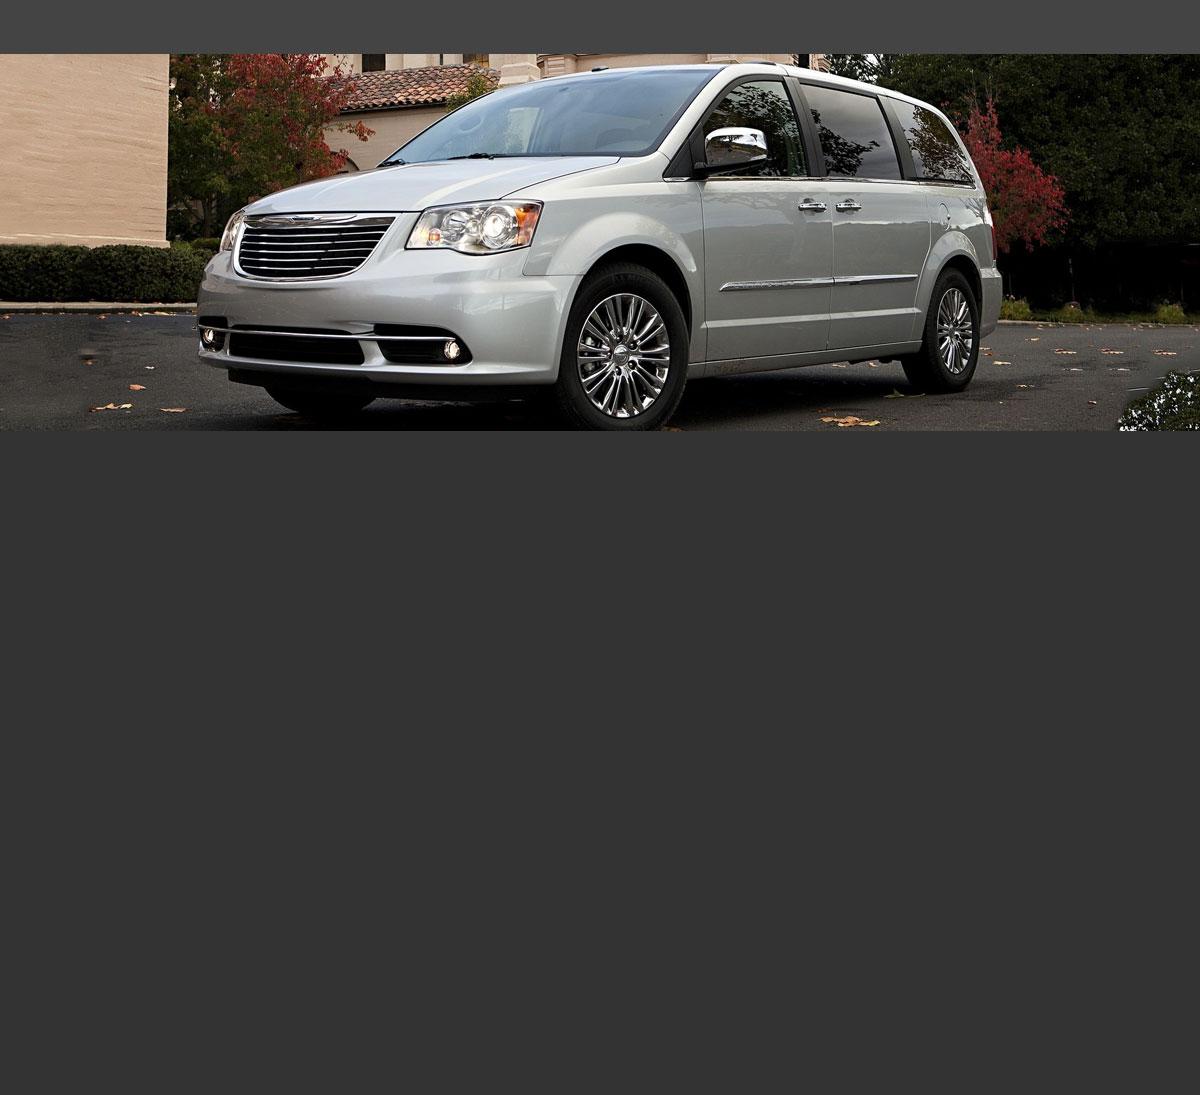 Honda Used Cars Bad Credit Auto Loans For Sale Grand Rapids Silverline  Motors